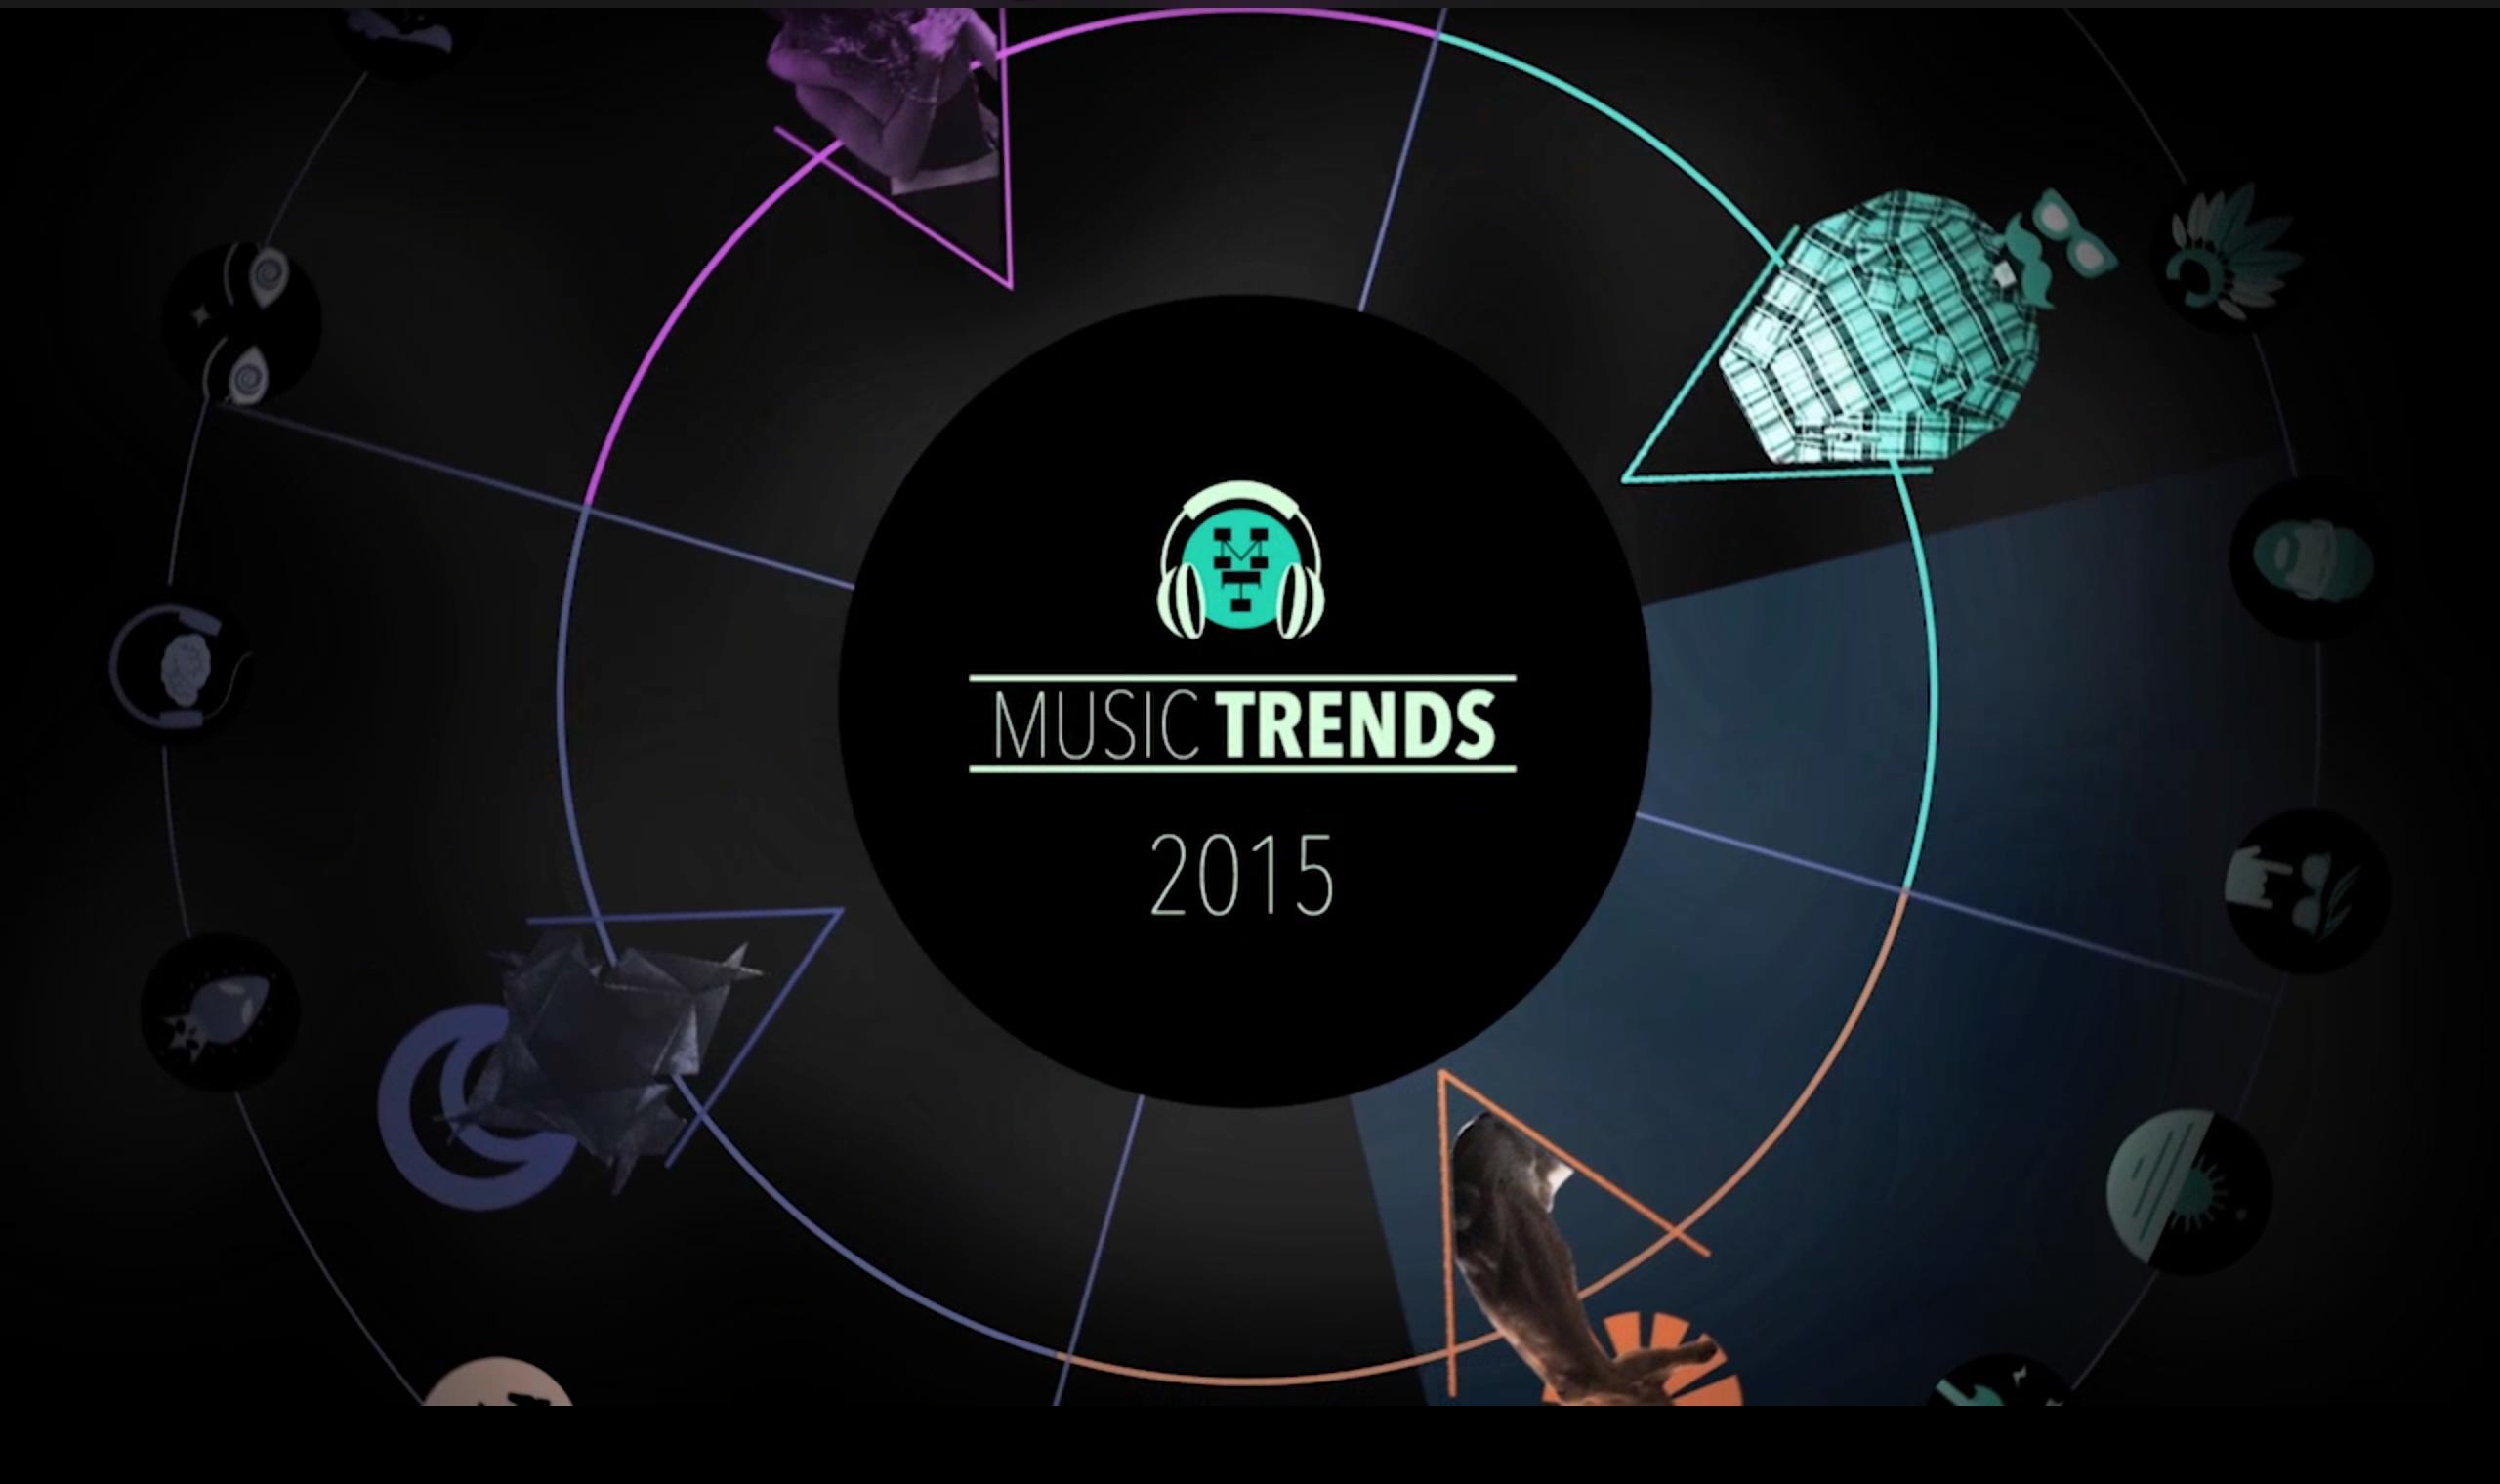 Music Trends 2015